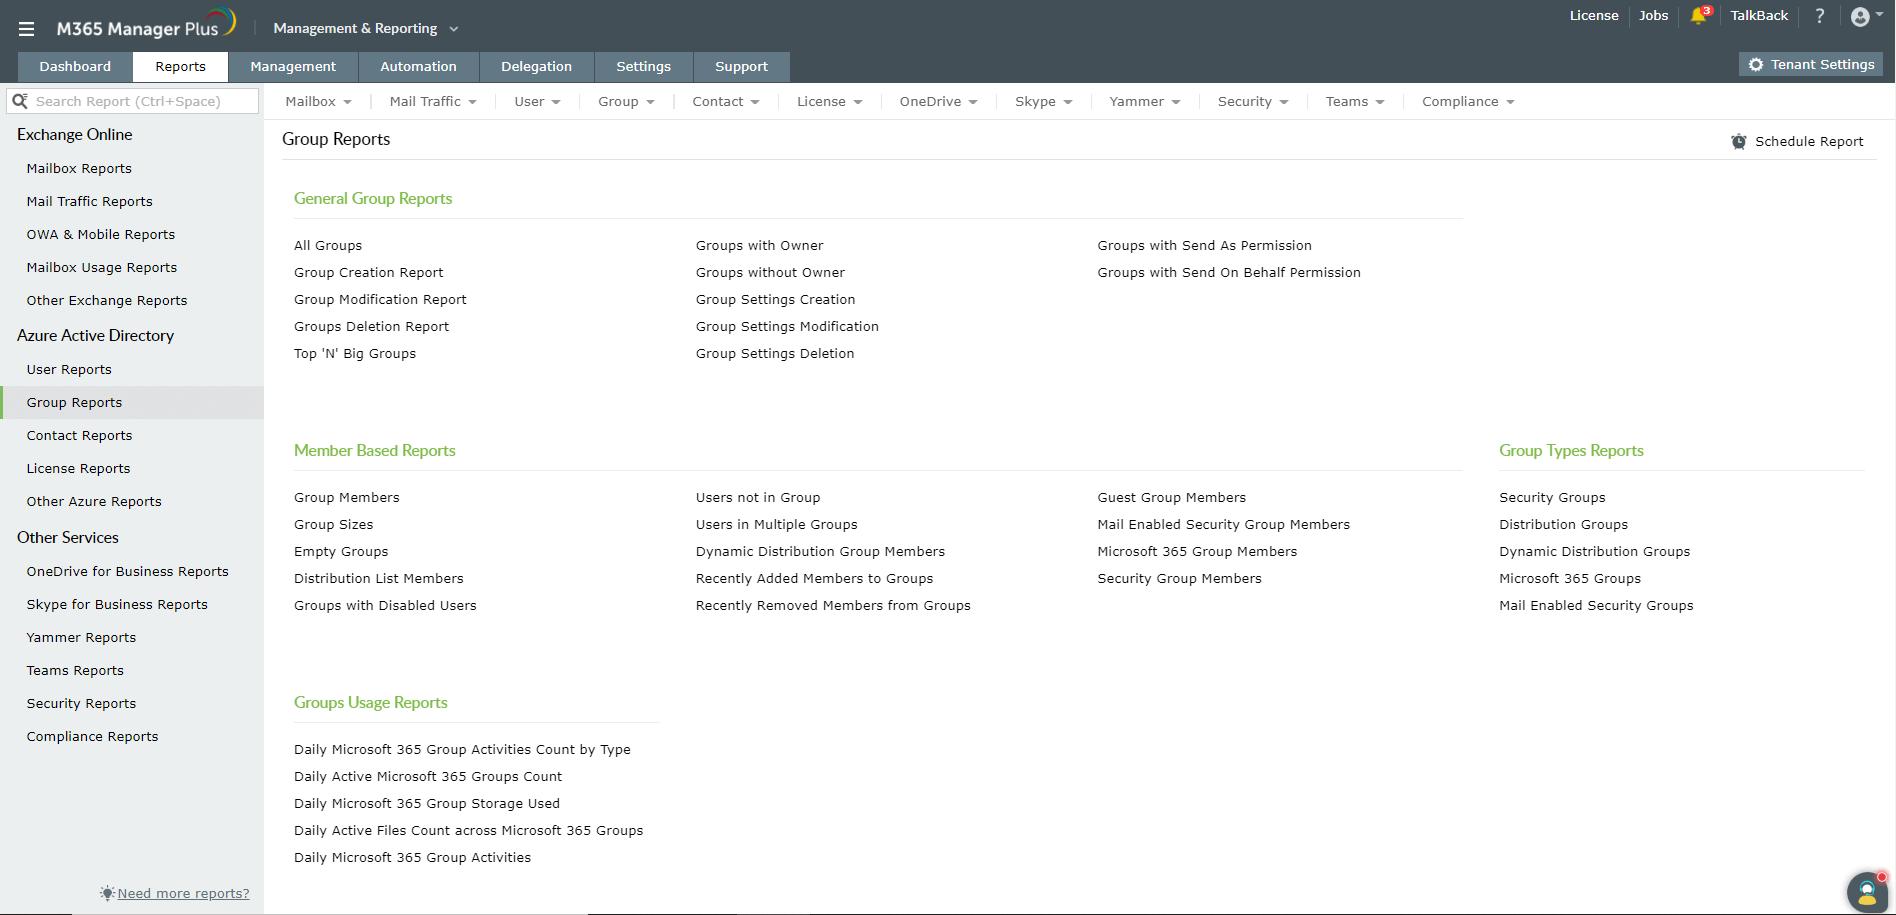 Microsoft 365 Group Reports